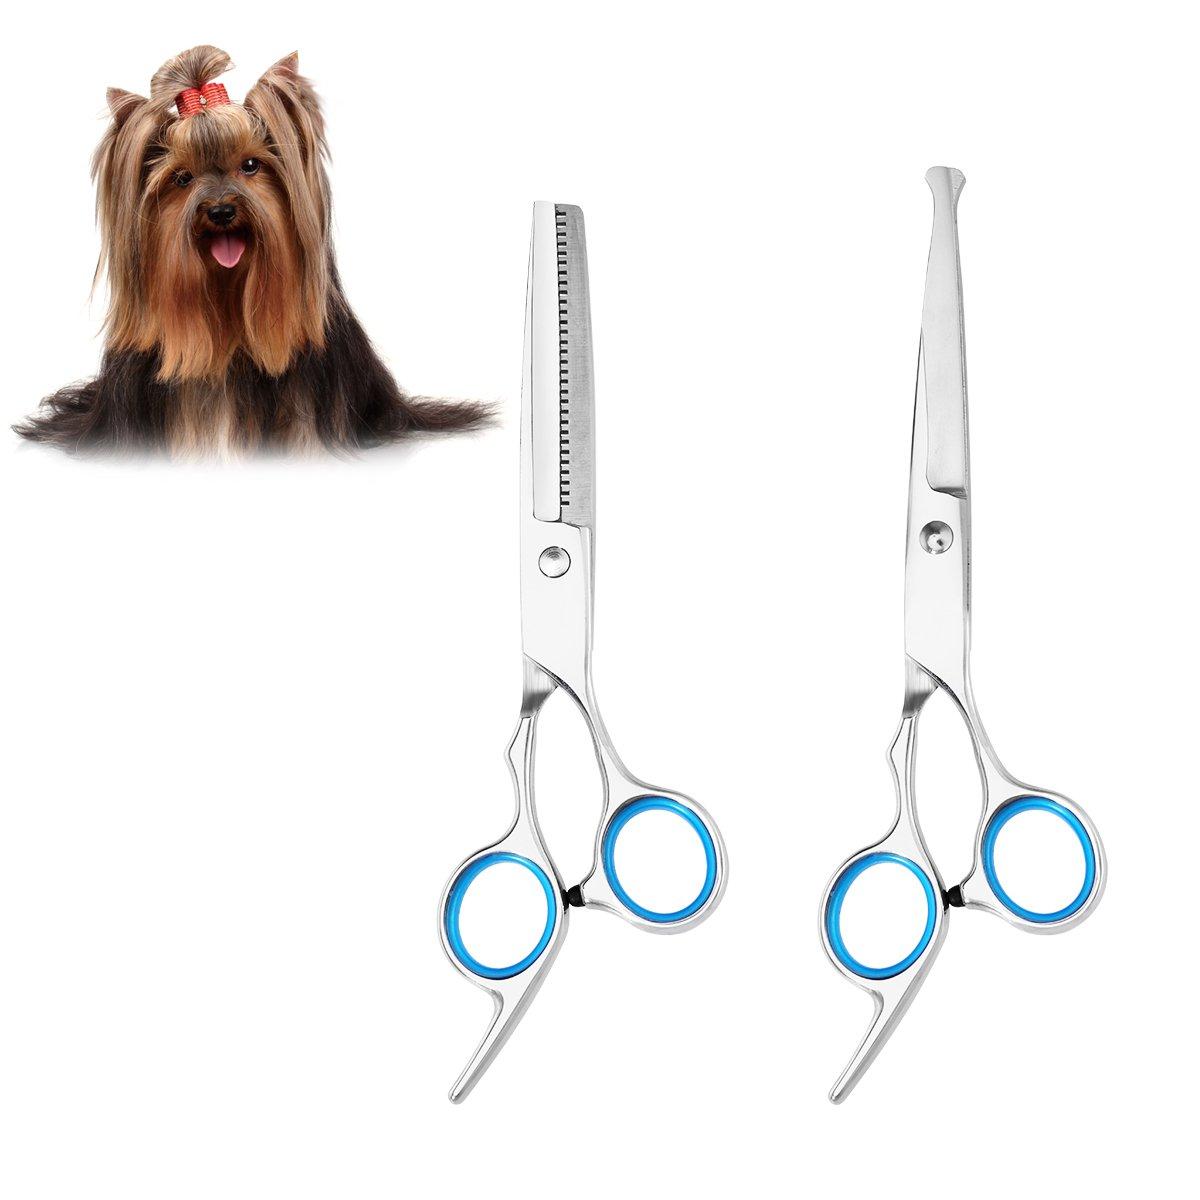 UEETEK Sharp and Strong Stainless Steel Blade Dog Cat Grooming Scissors Pet Grooming Kit- PACK OF 2